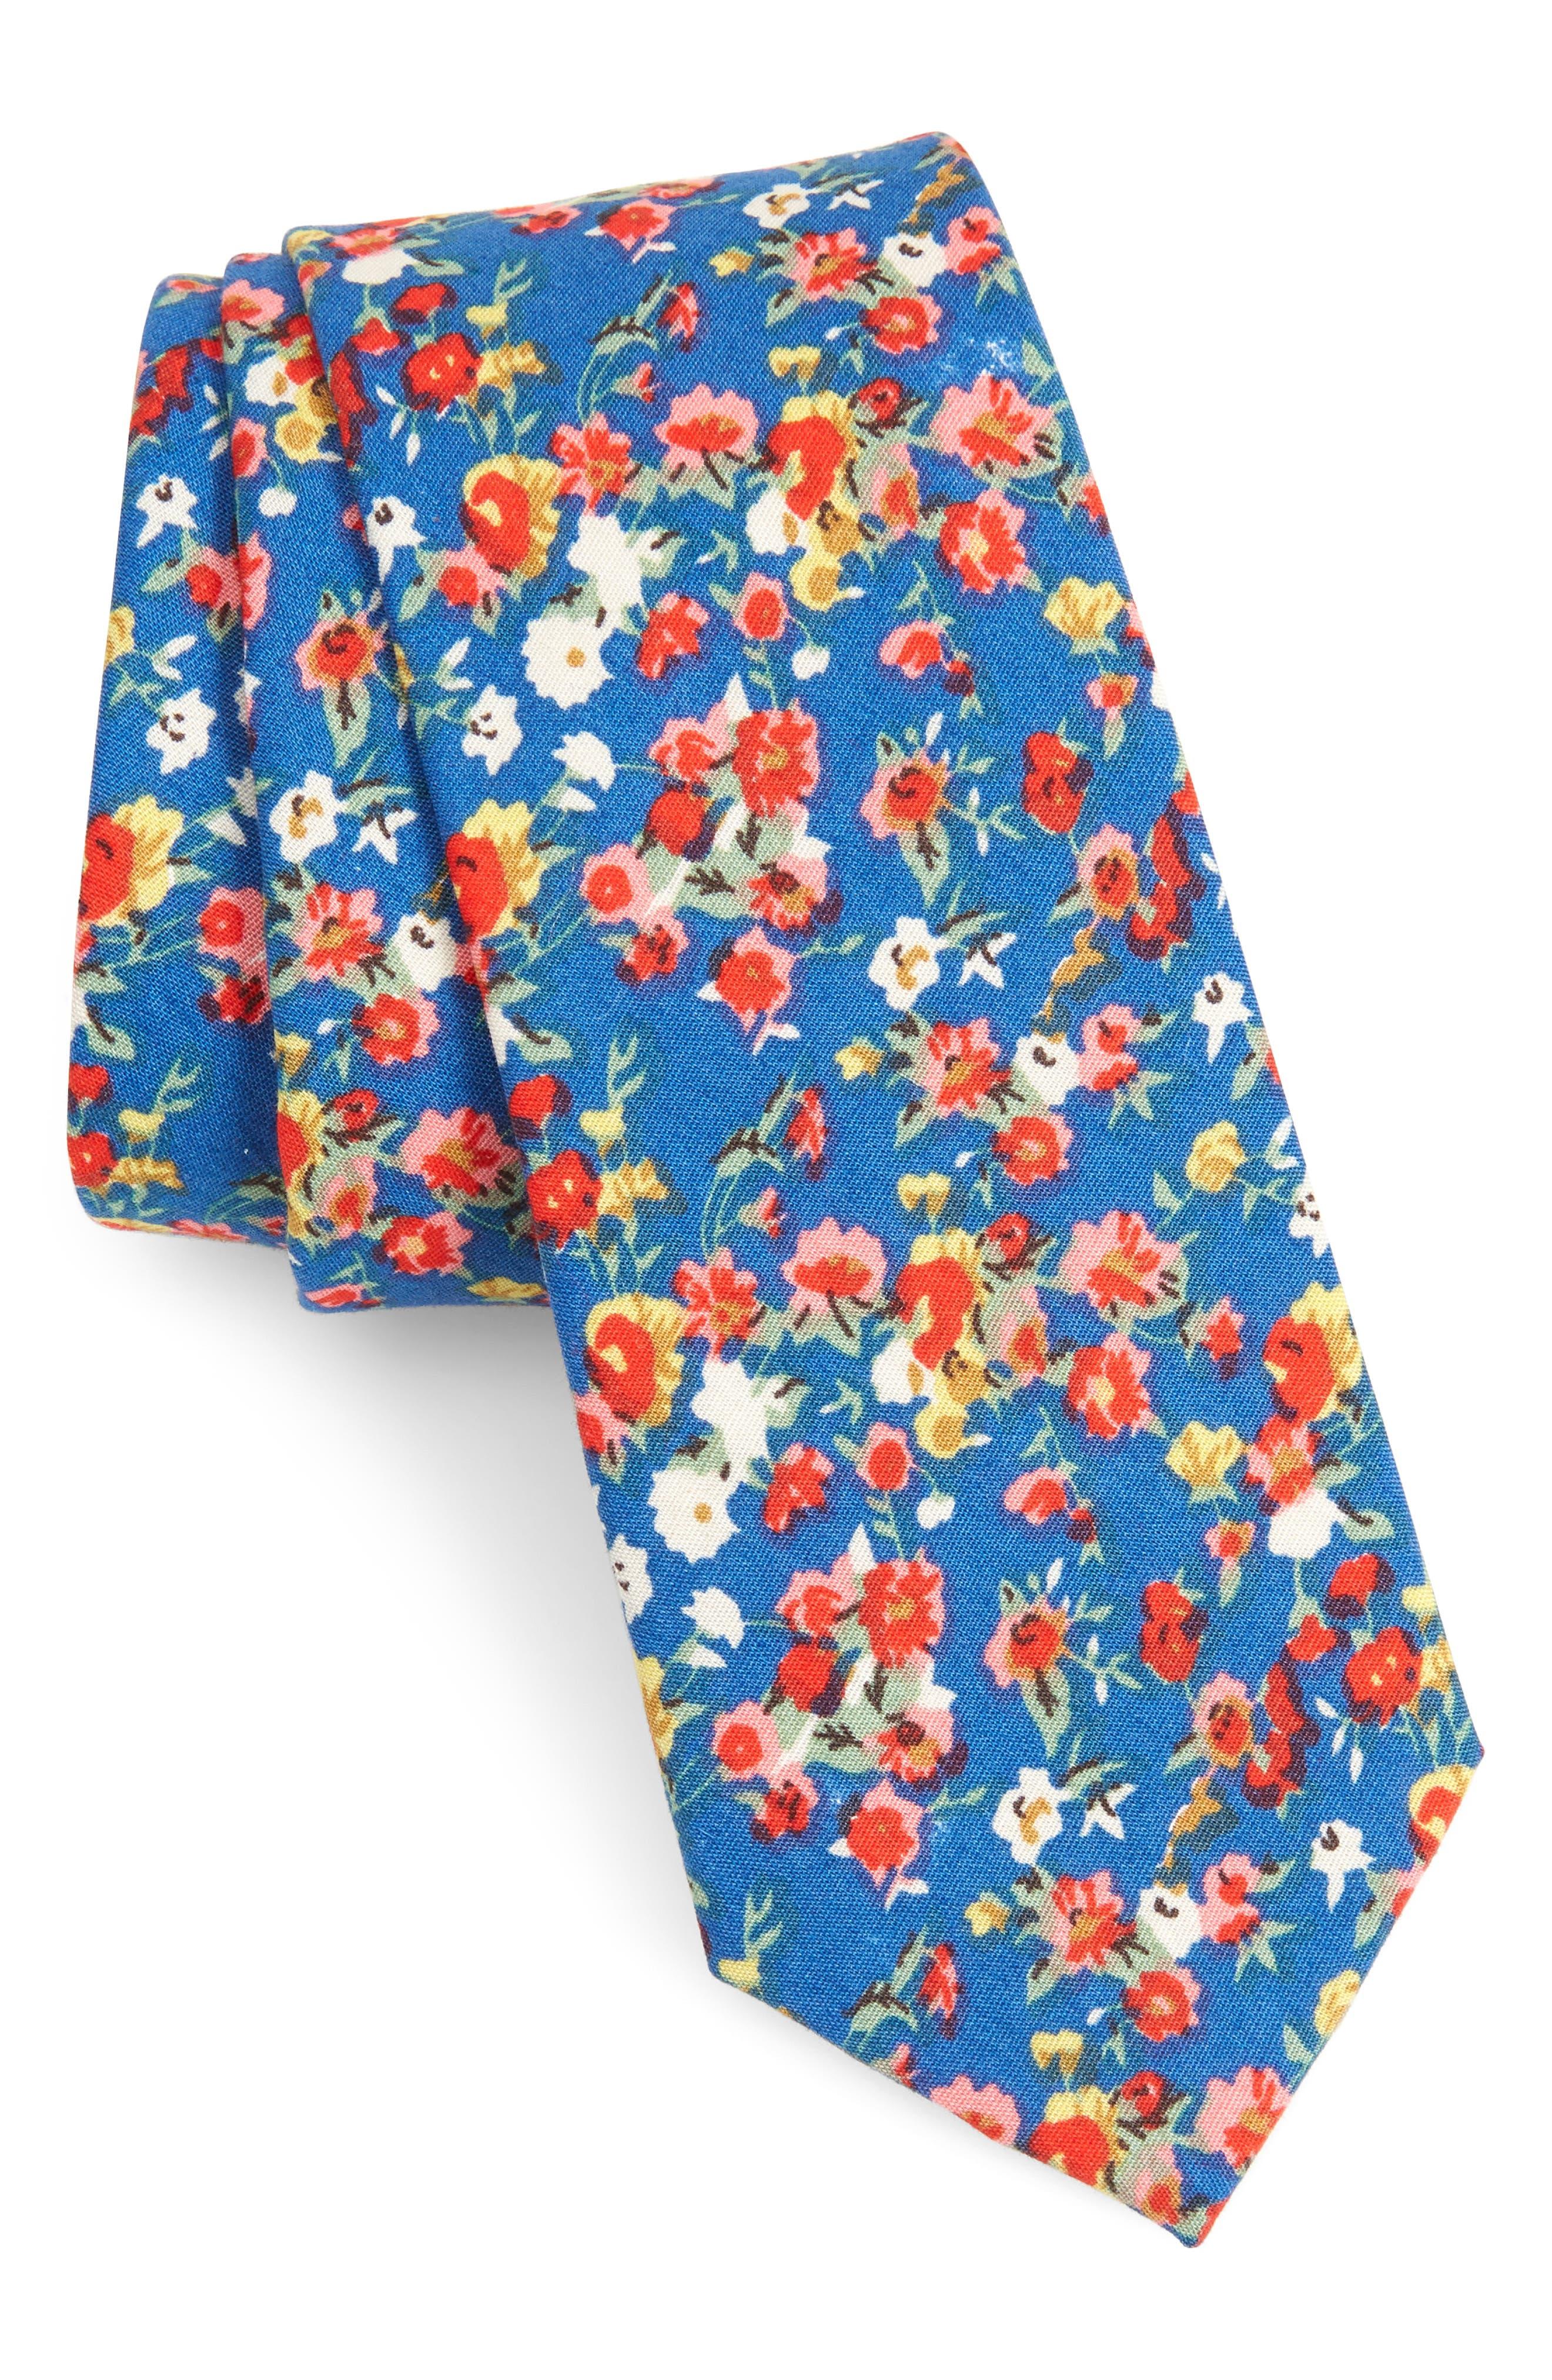 Ager Floral Cotton Tie,                             Main thumbnail 1, color,                             NAVY